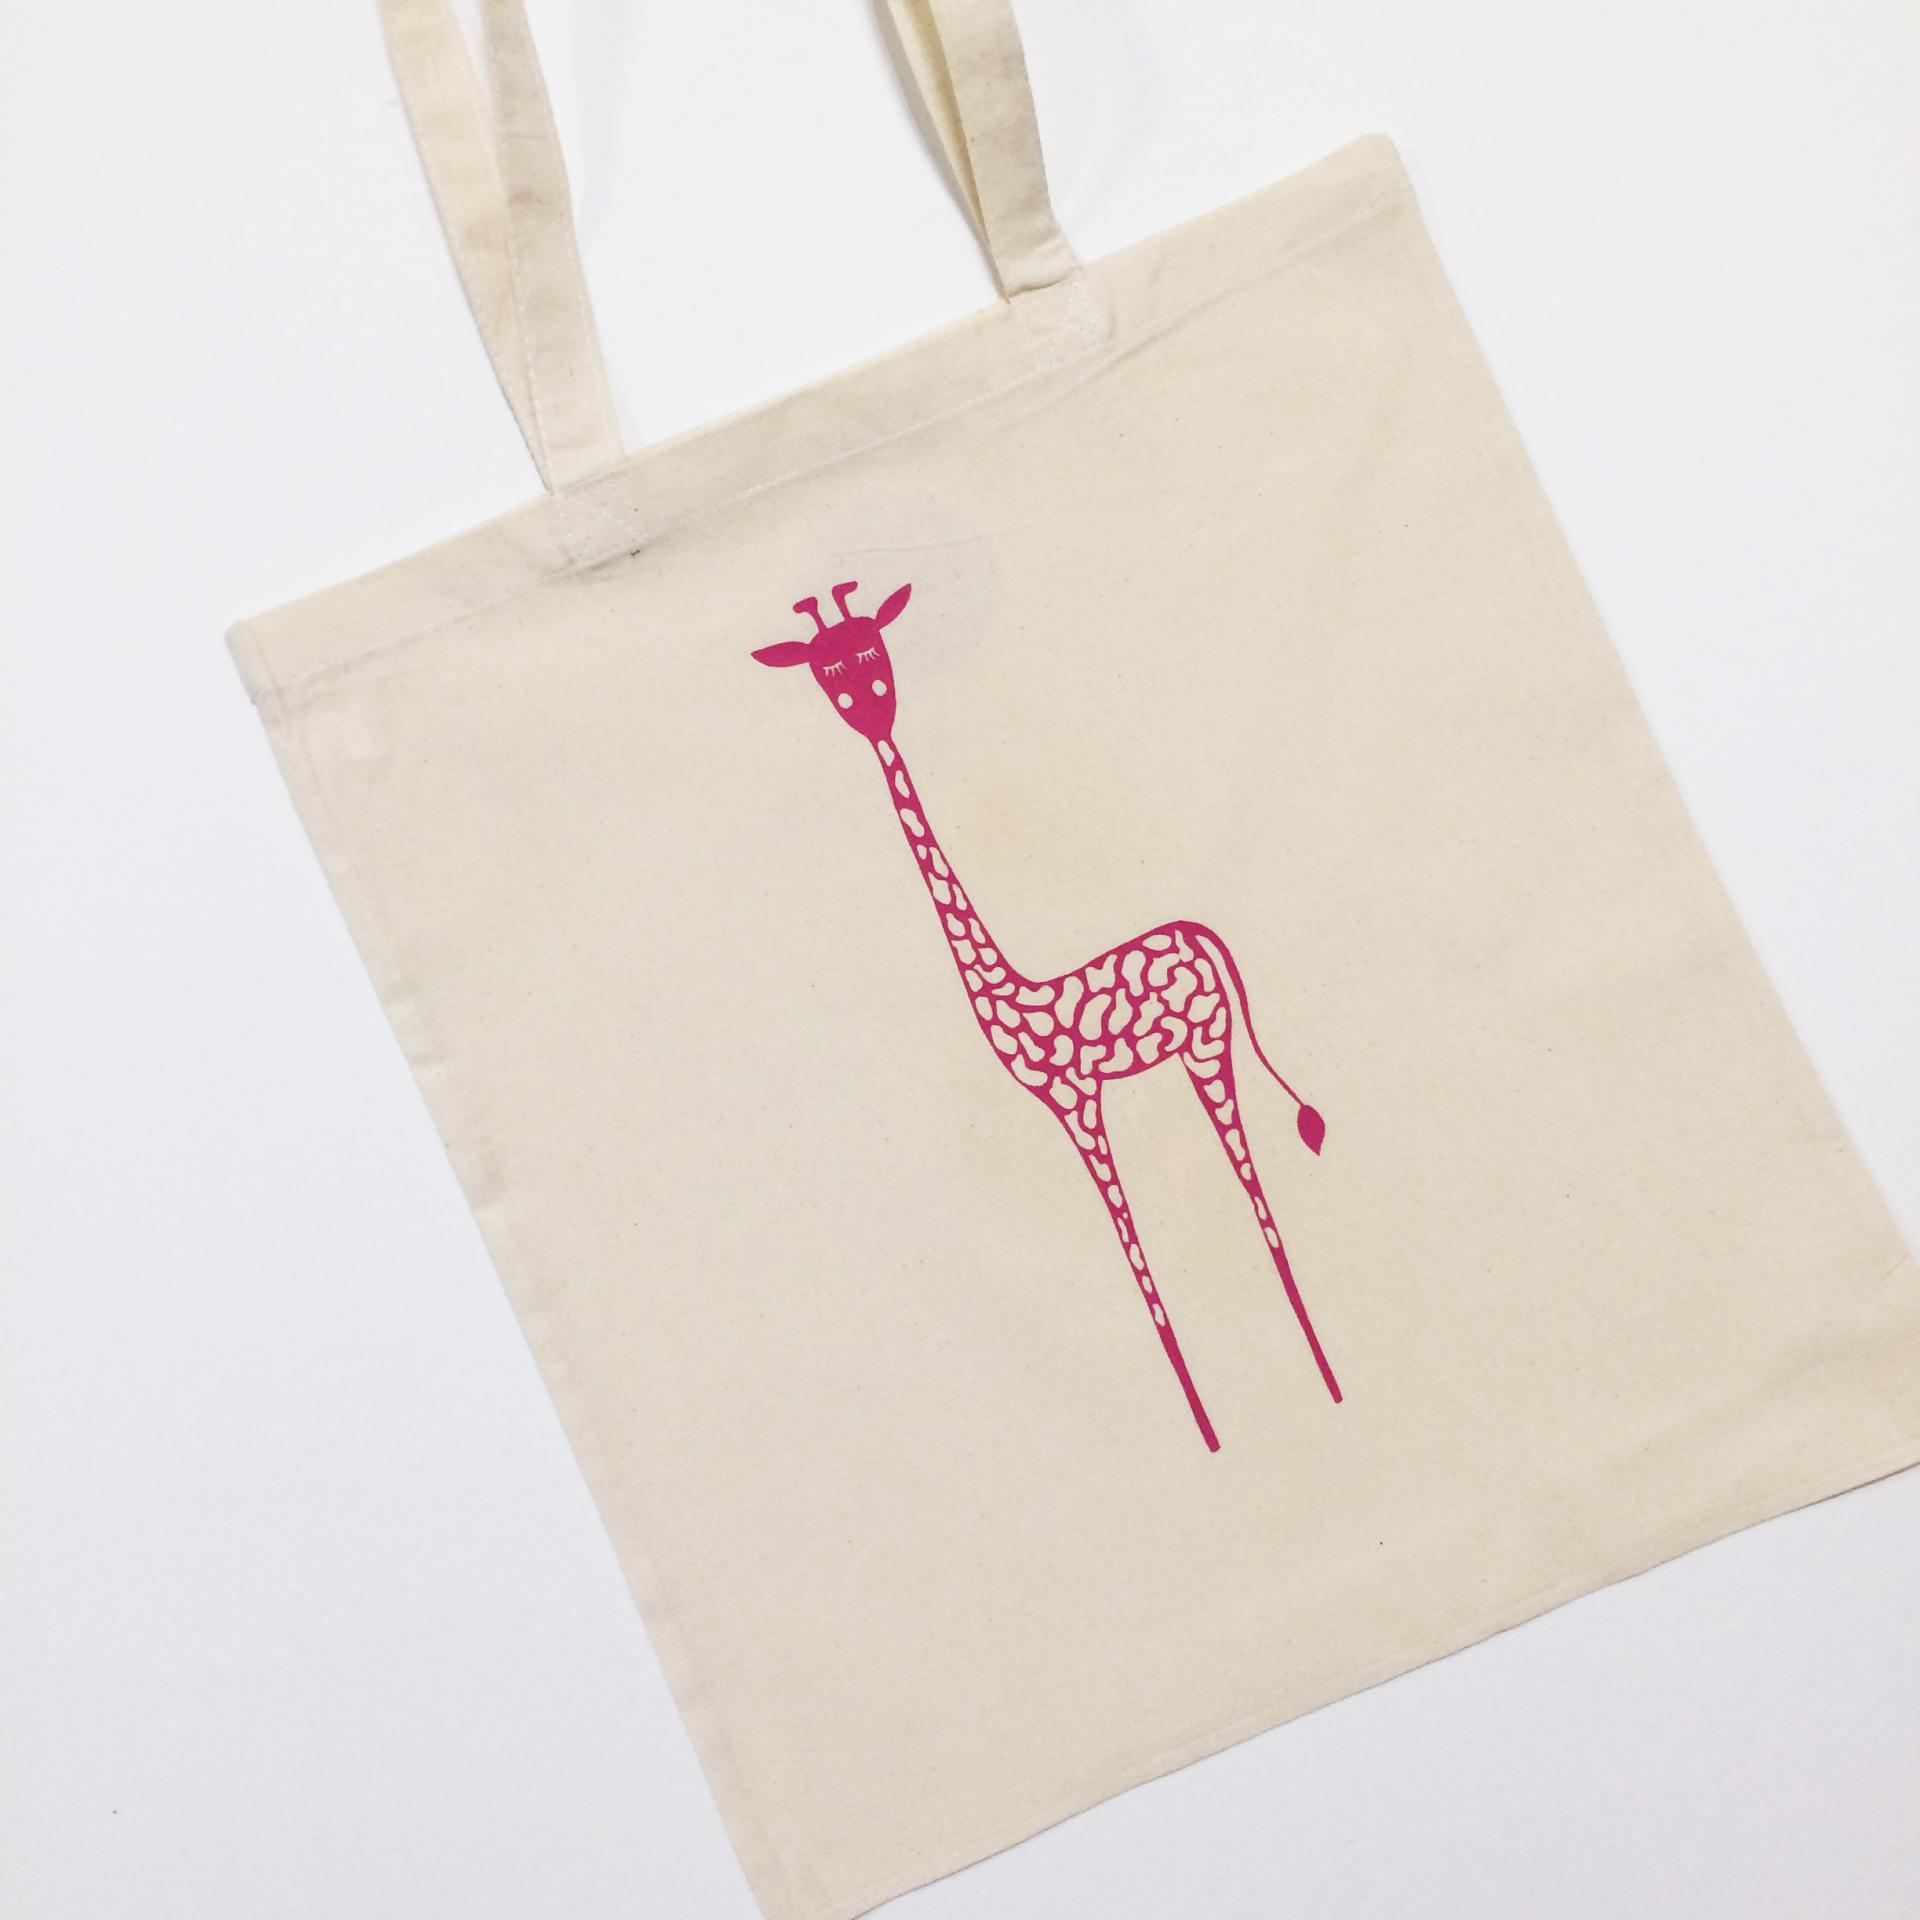 Giraffe - £6